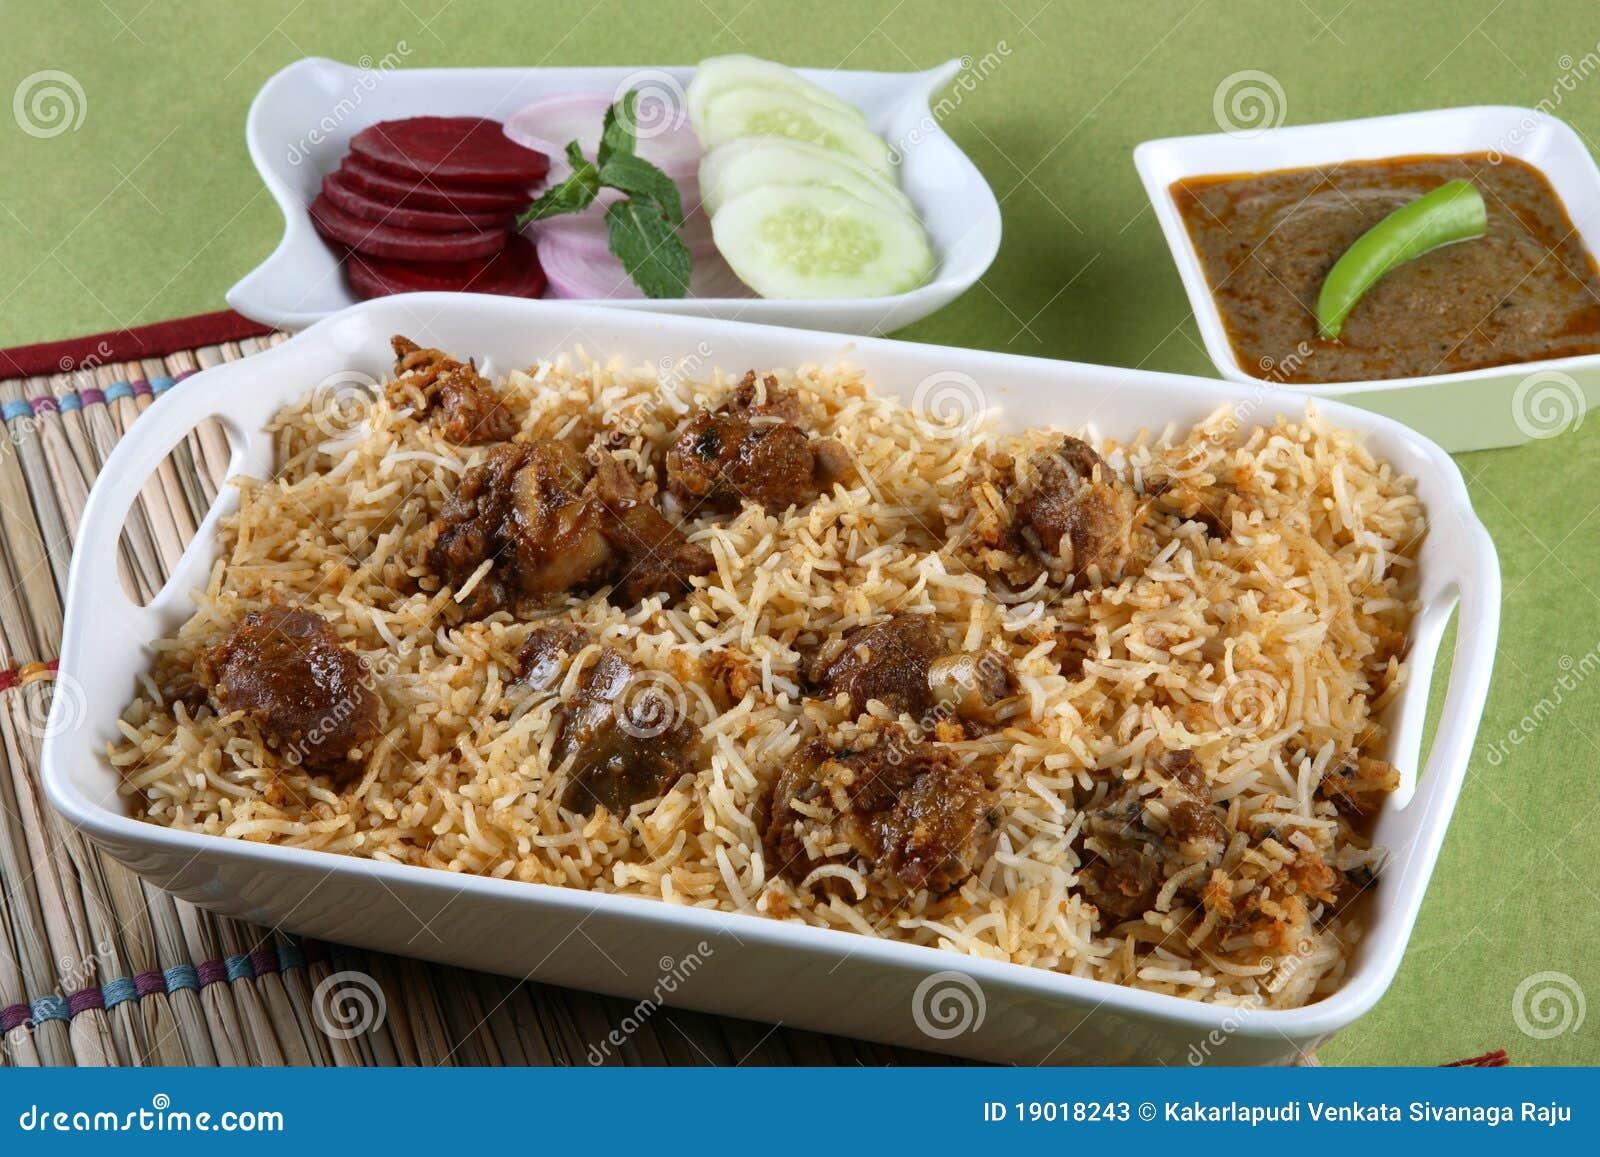 Hyderabadi biryani a popular chicken or mutton based biryani.